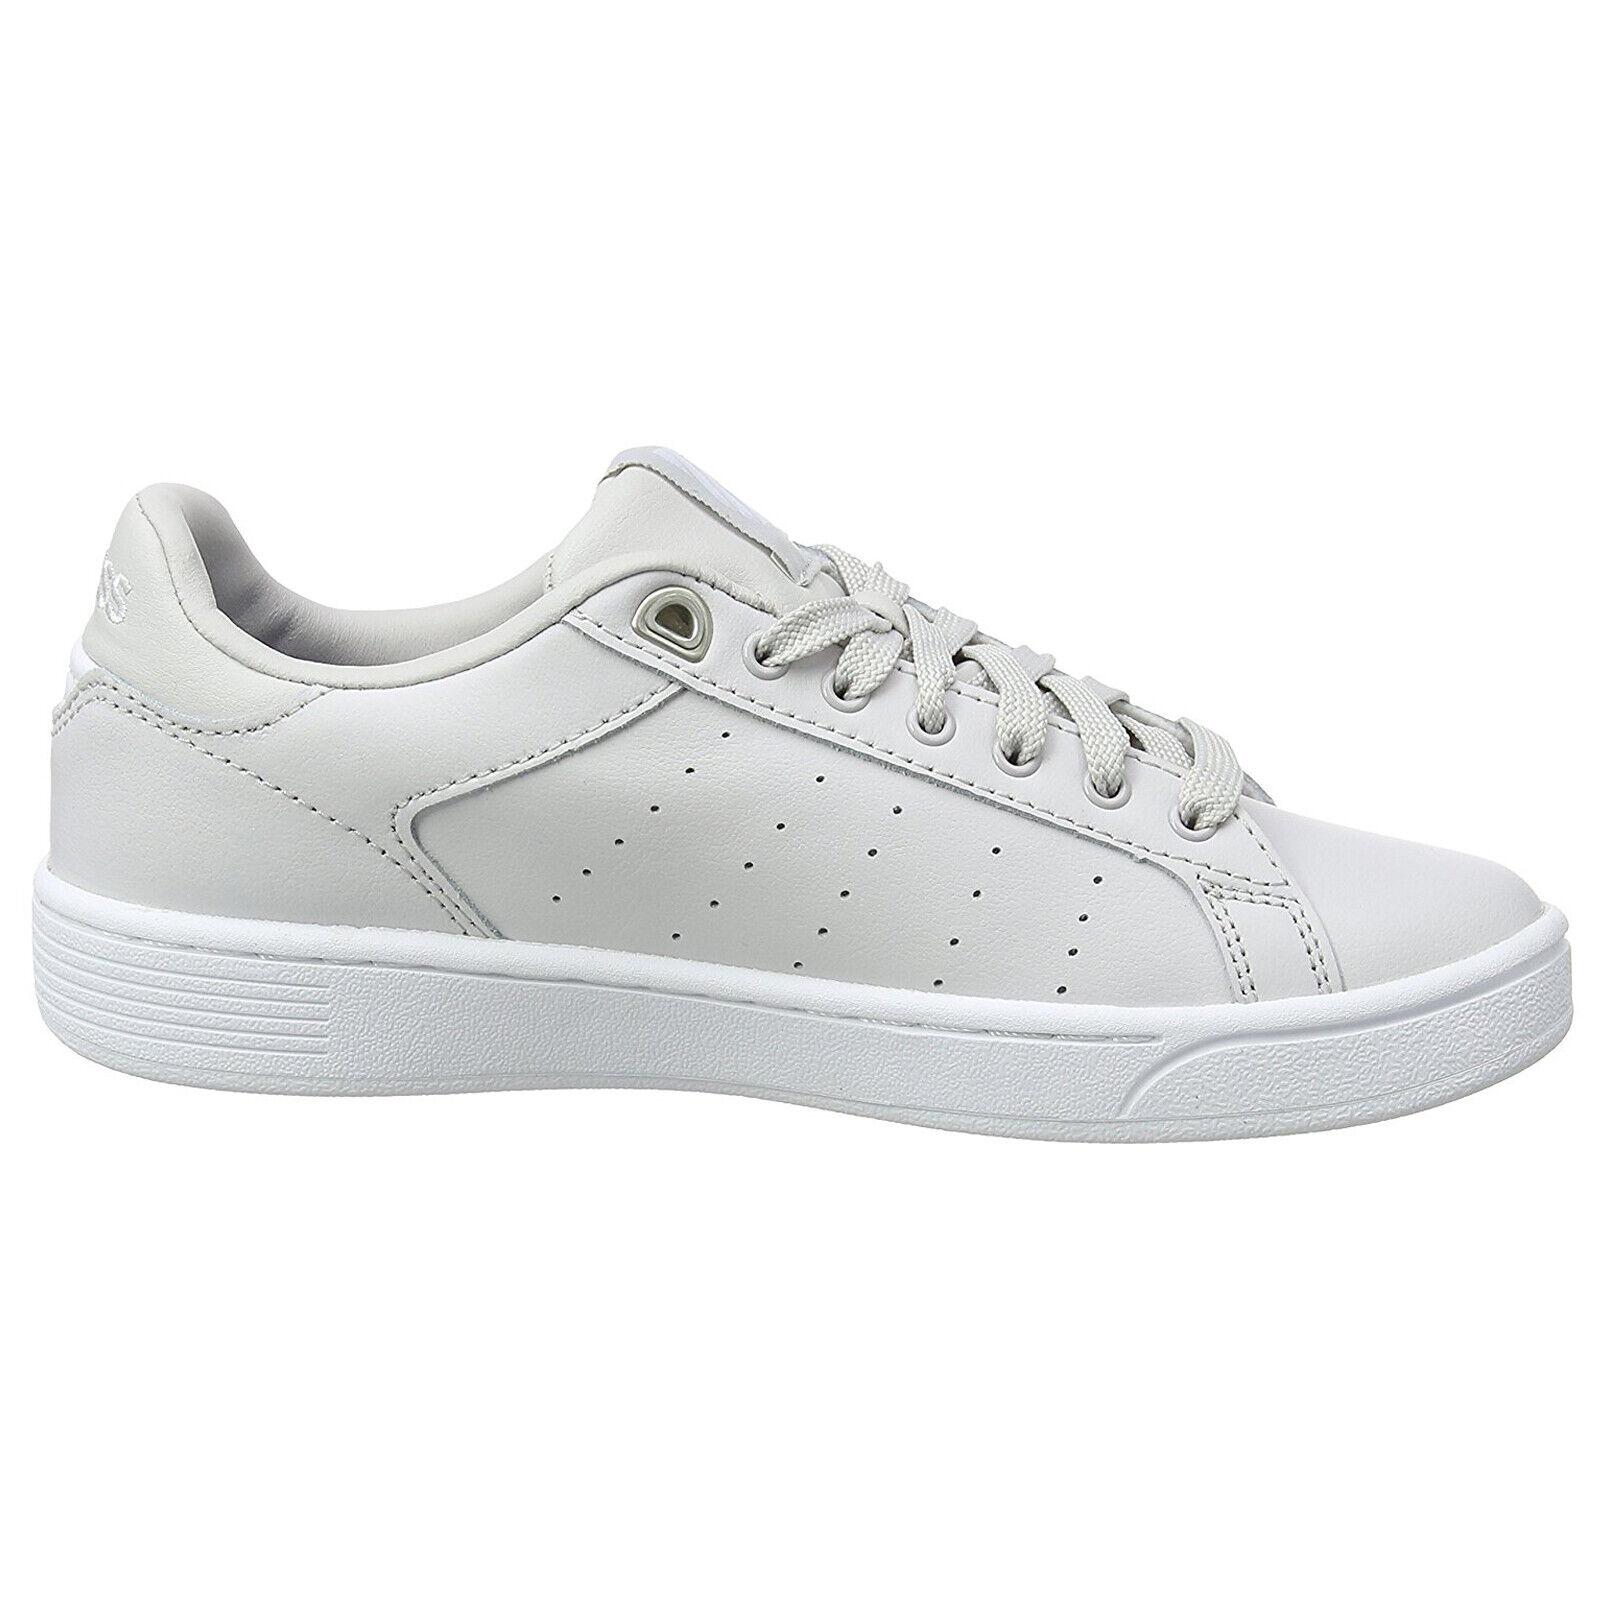 K Swiss Clean Court CMF Women's Trainer Sneaker H